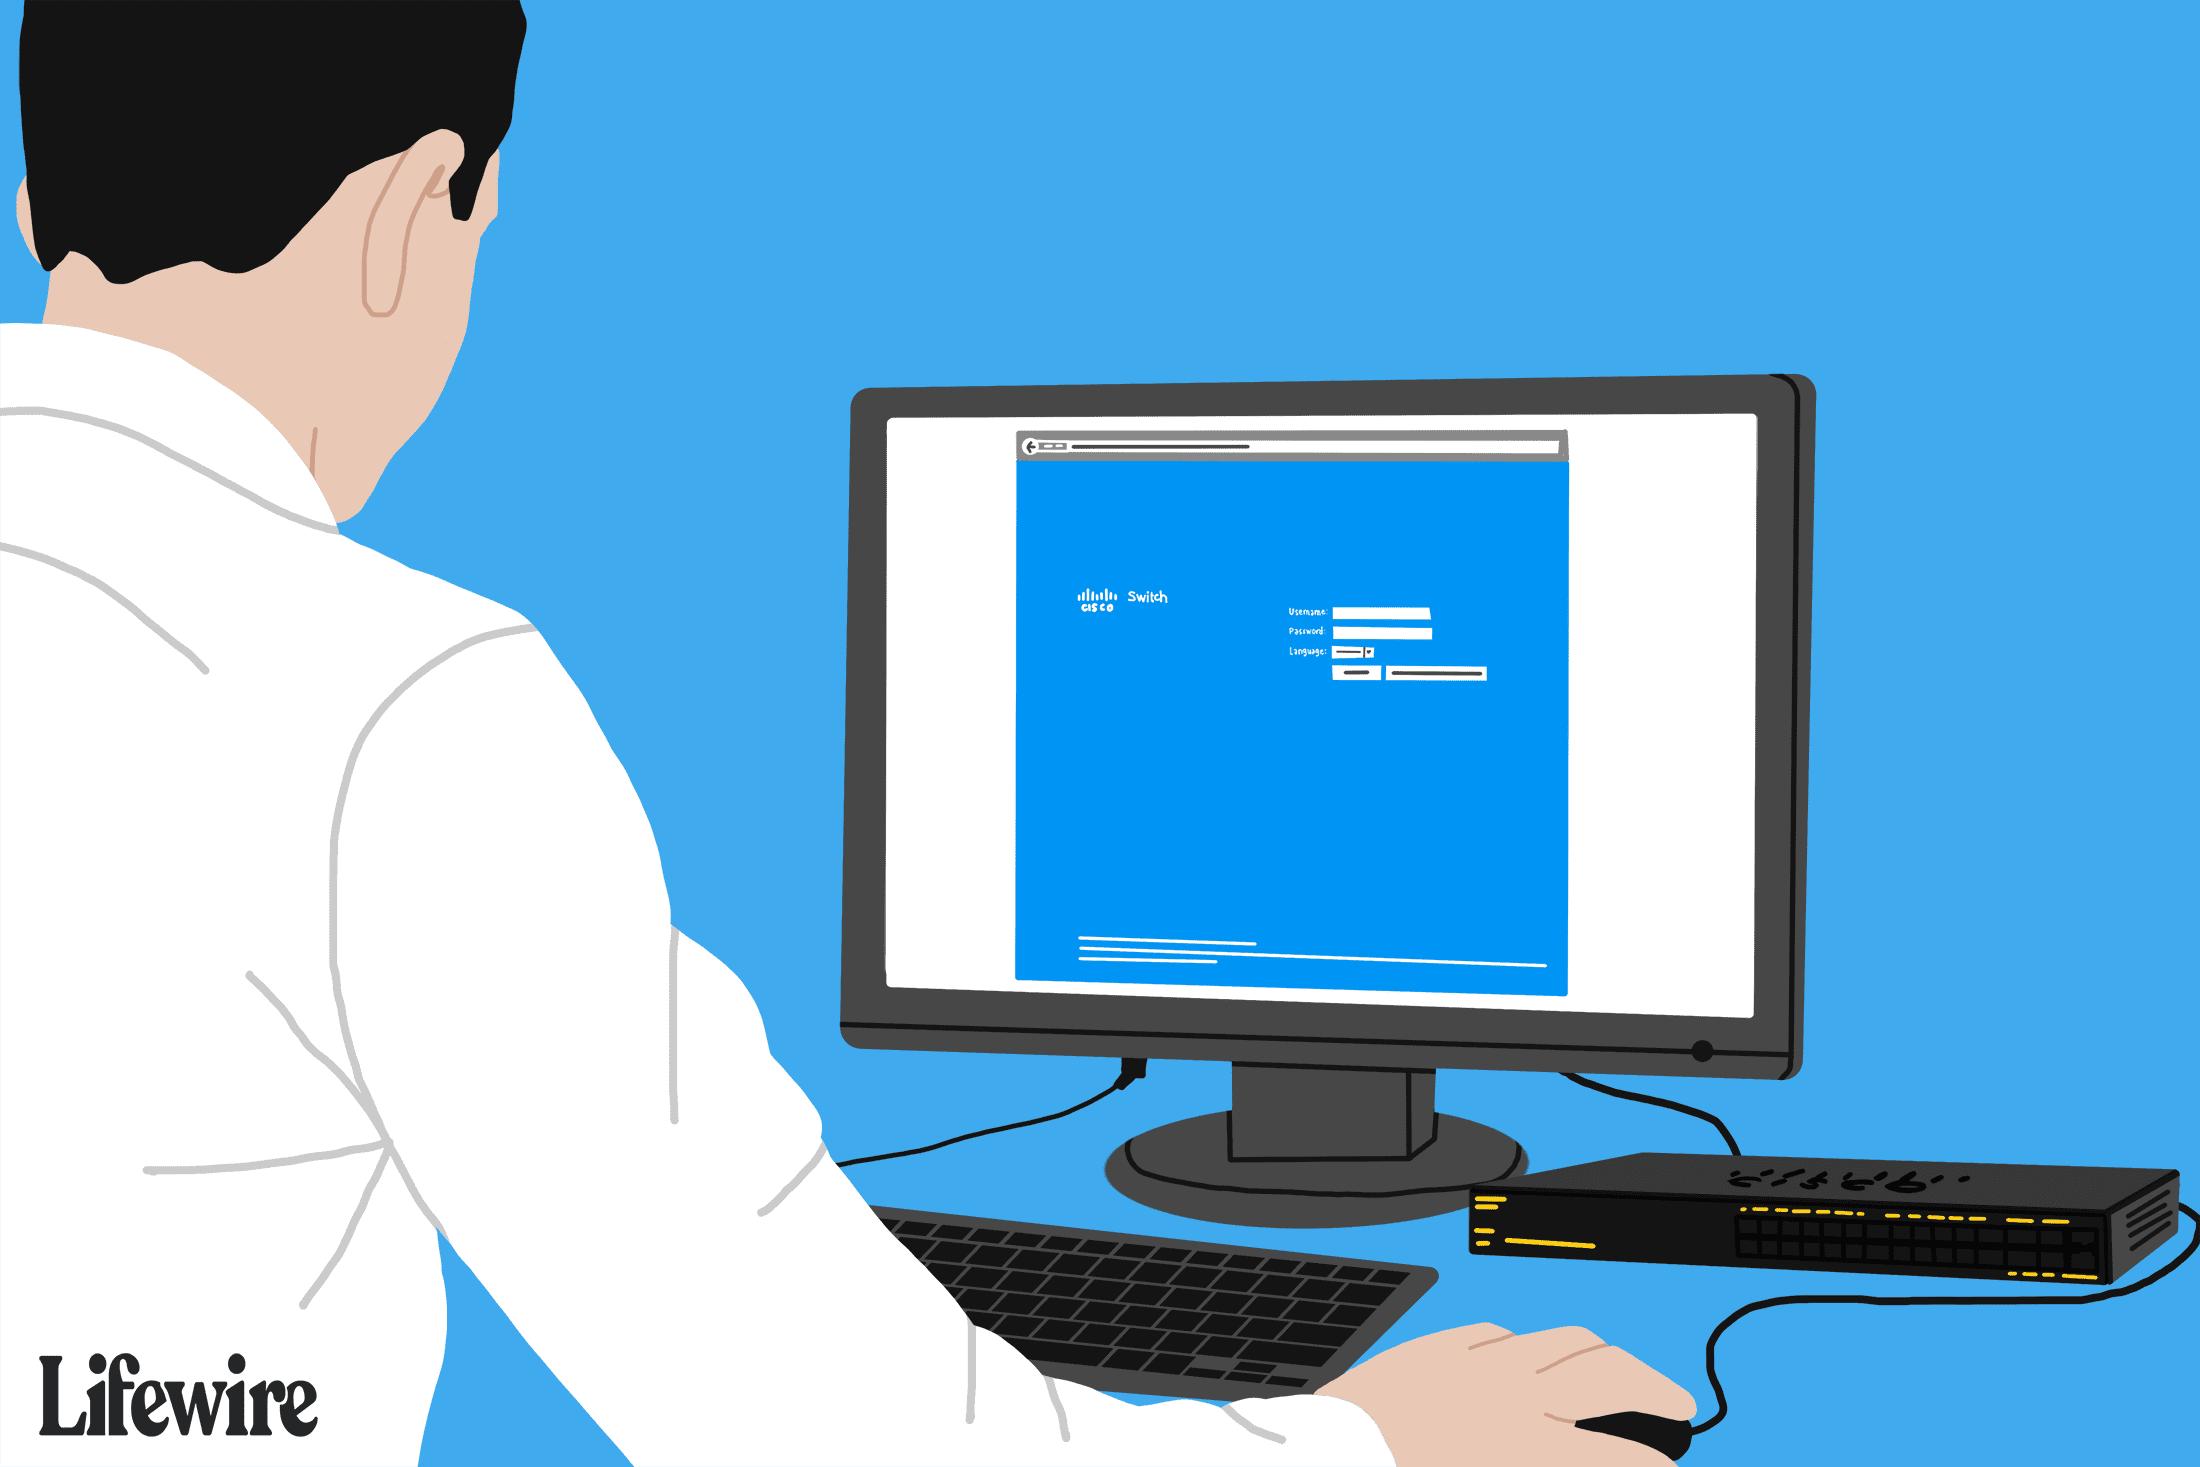 Cisco username and password screen on a computer screen